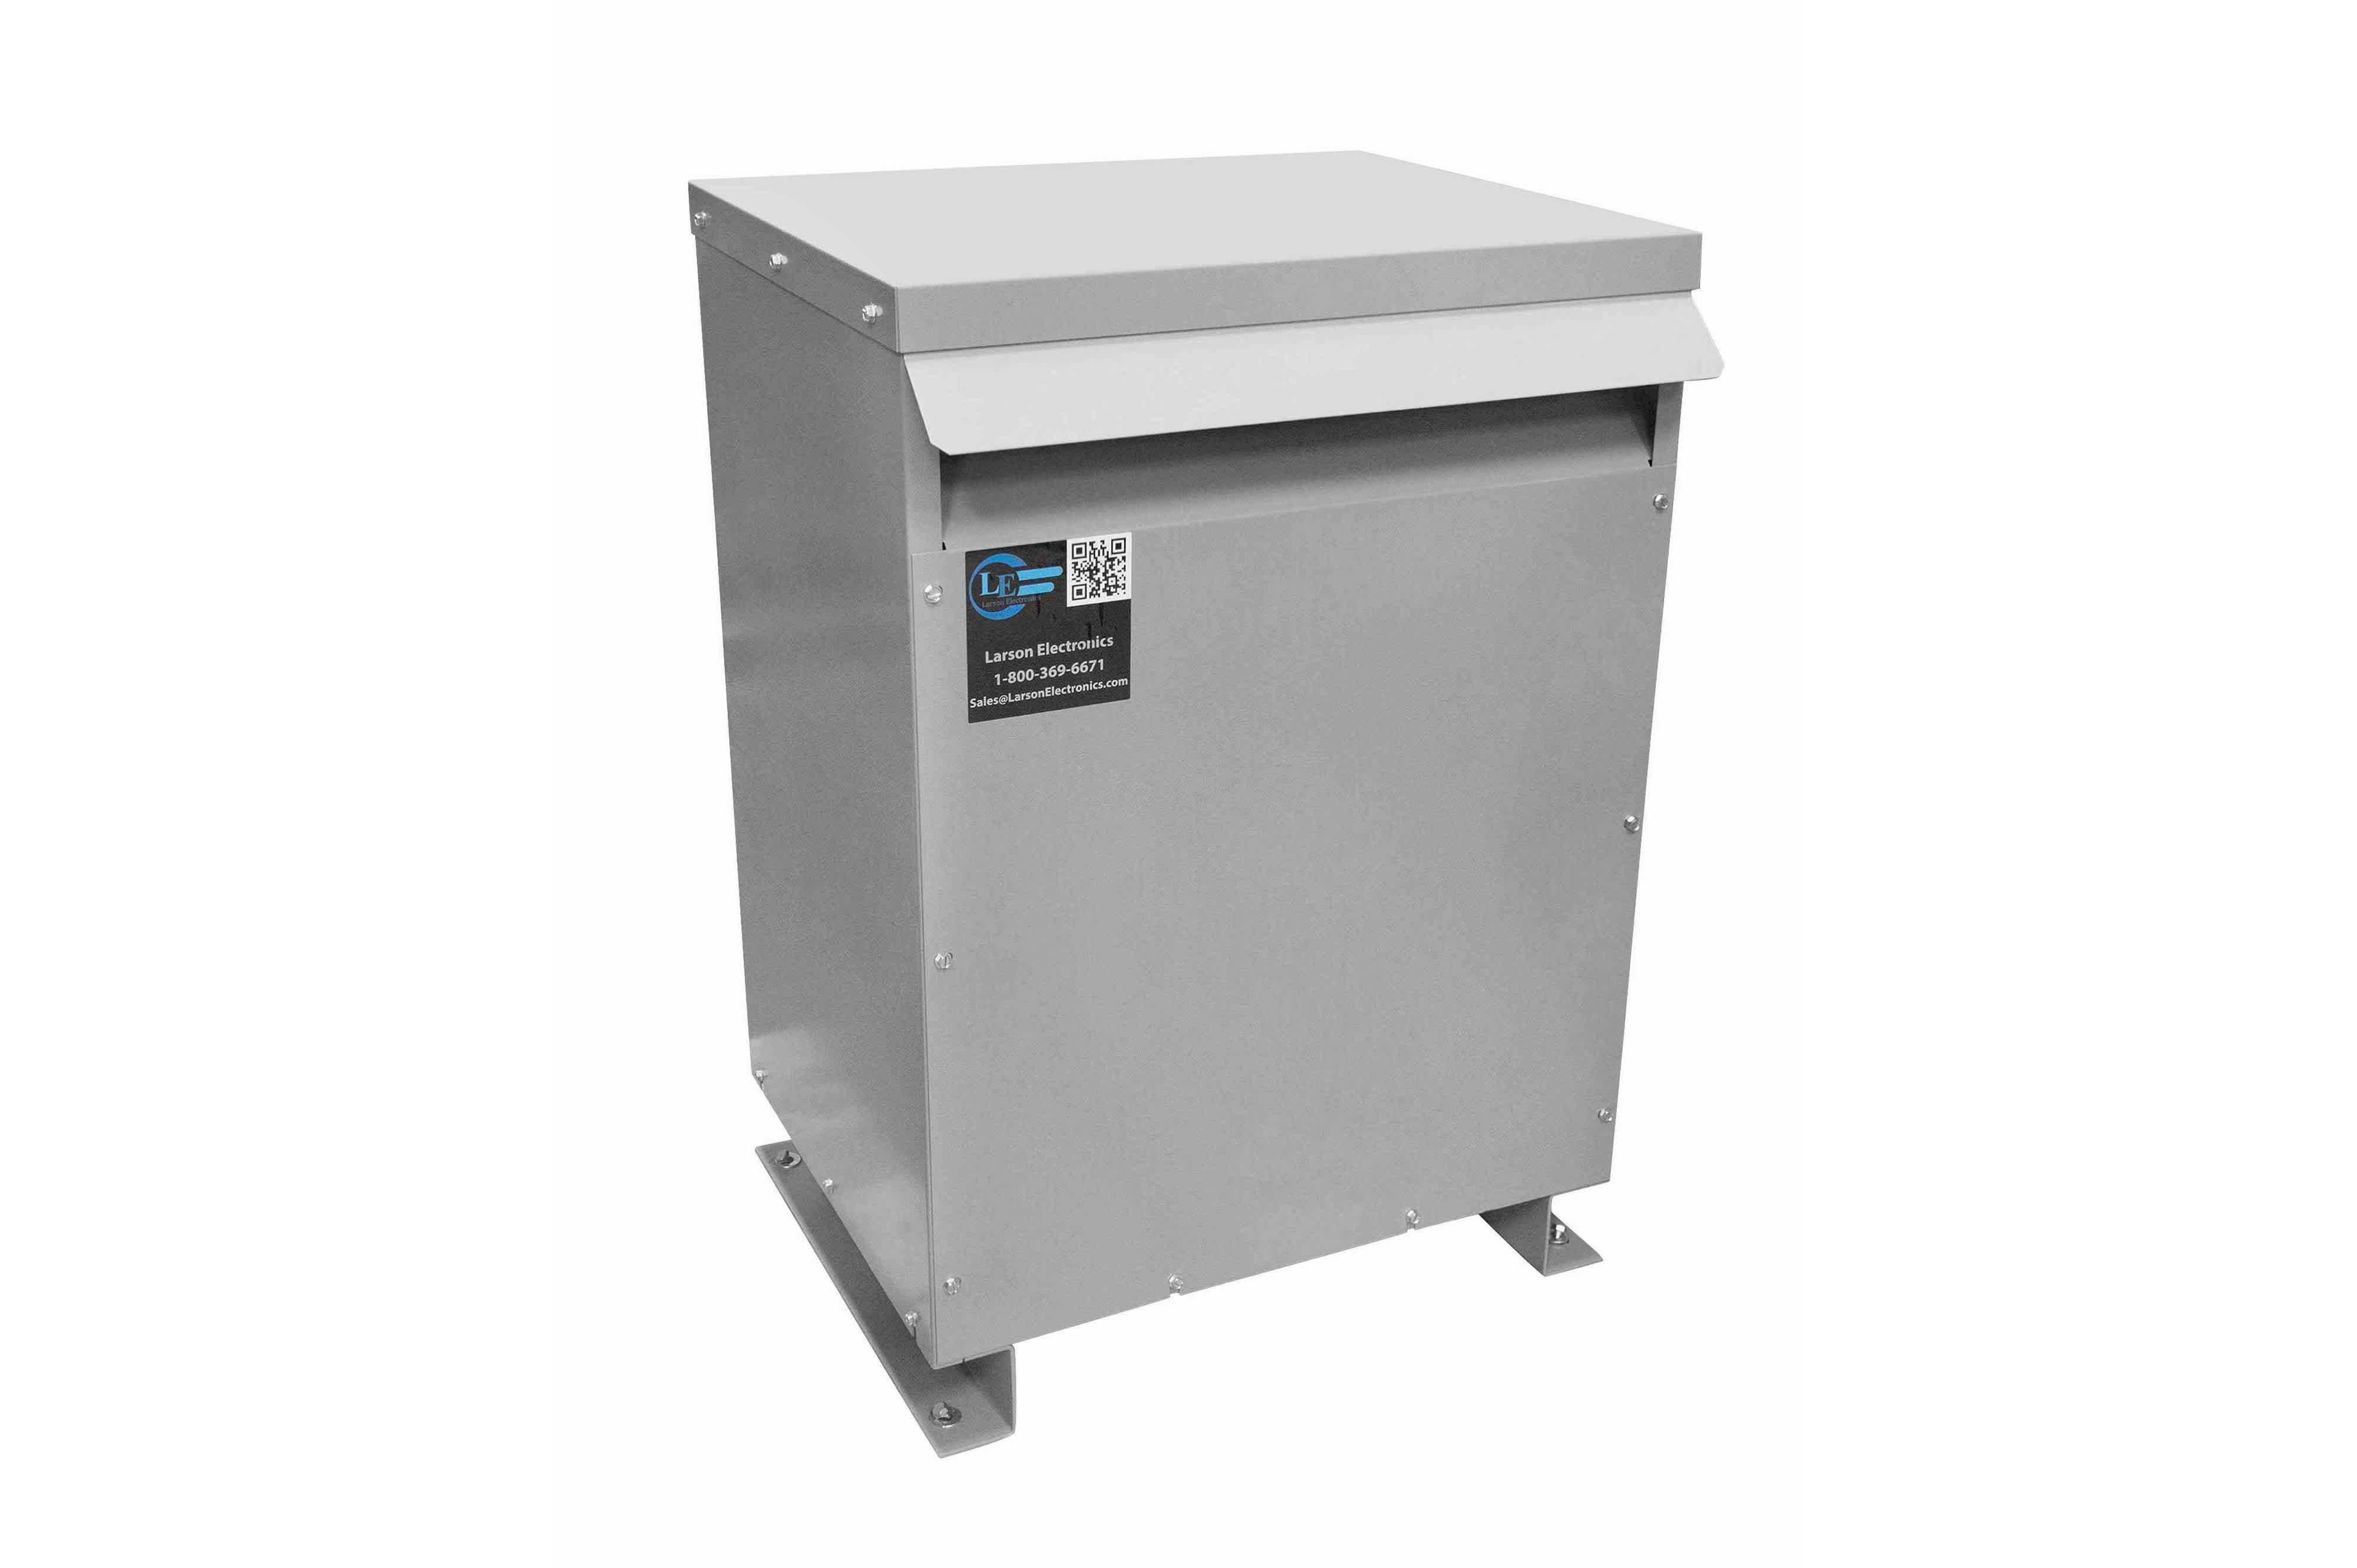 70 kVA 3PH Isolation Transformer, 575V Wye Primary, 240V Delta Secondary, N3R, Ventilated, 60 Hz